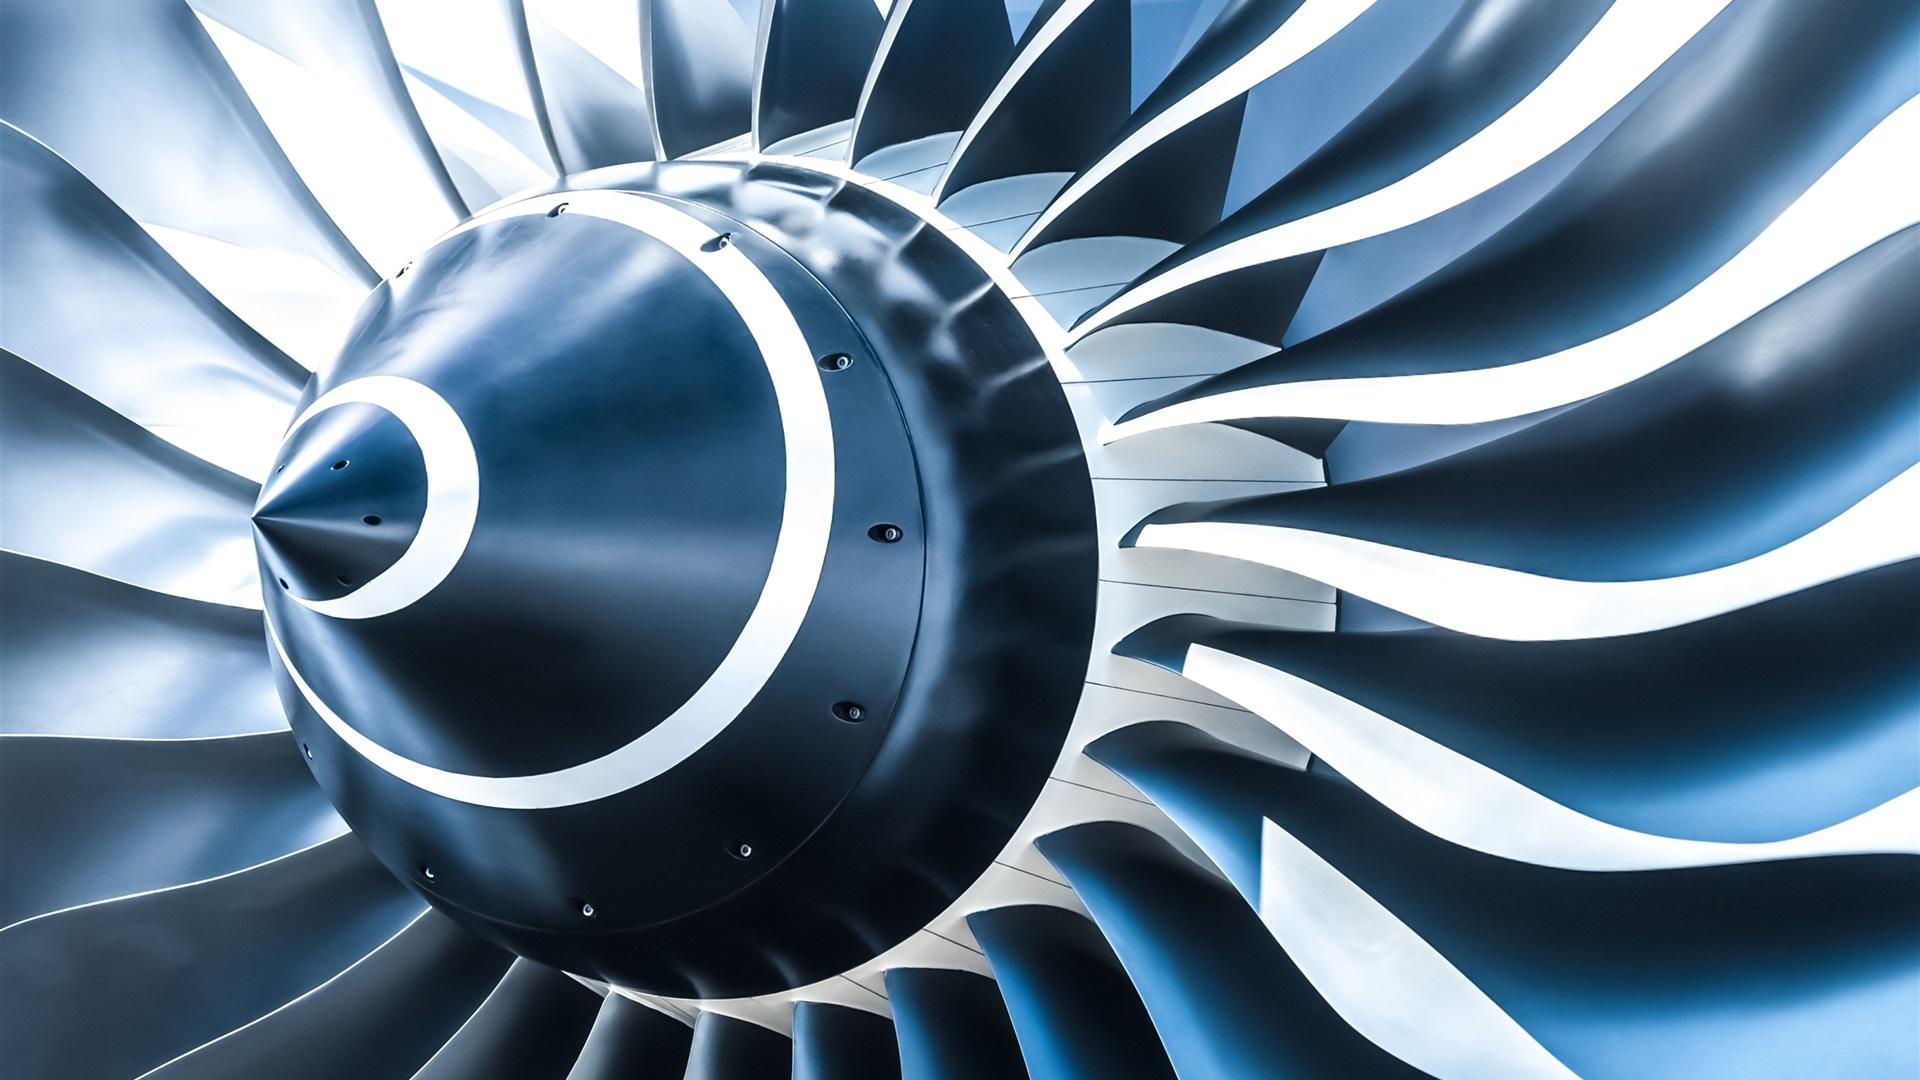 Wallpaper Turboprop Jet Engine Aircraft 3d 2560x1600